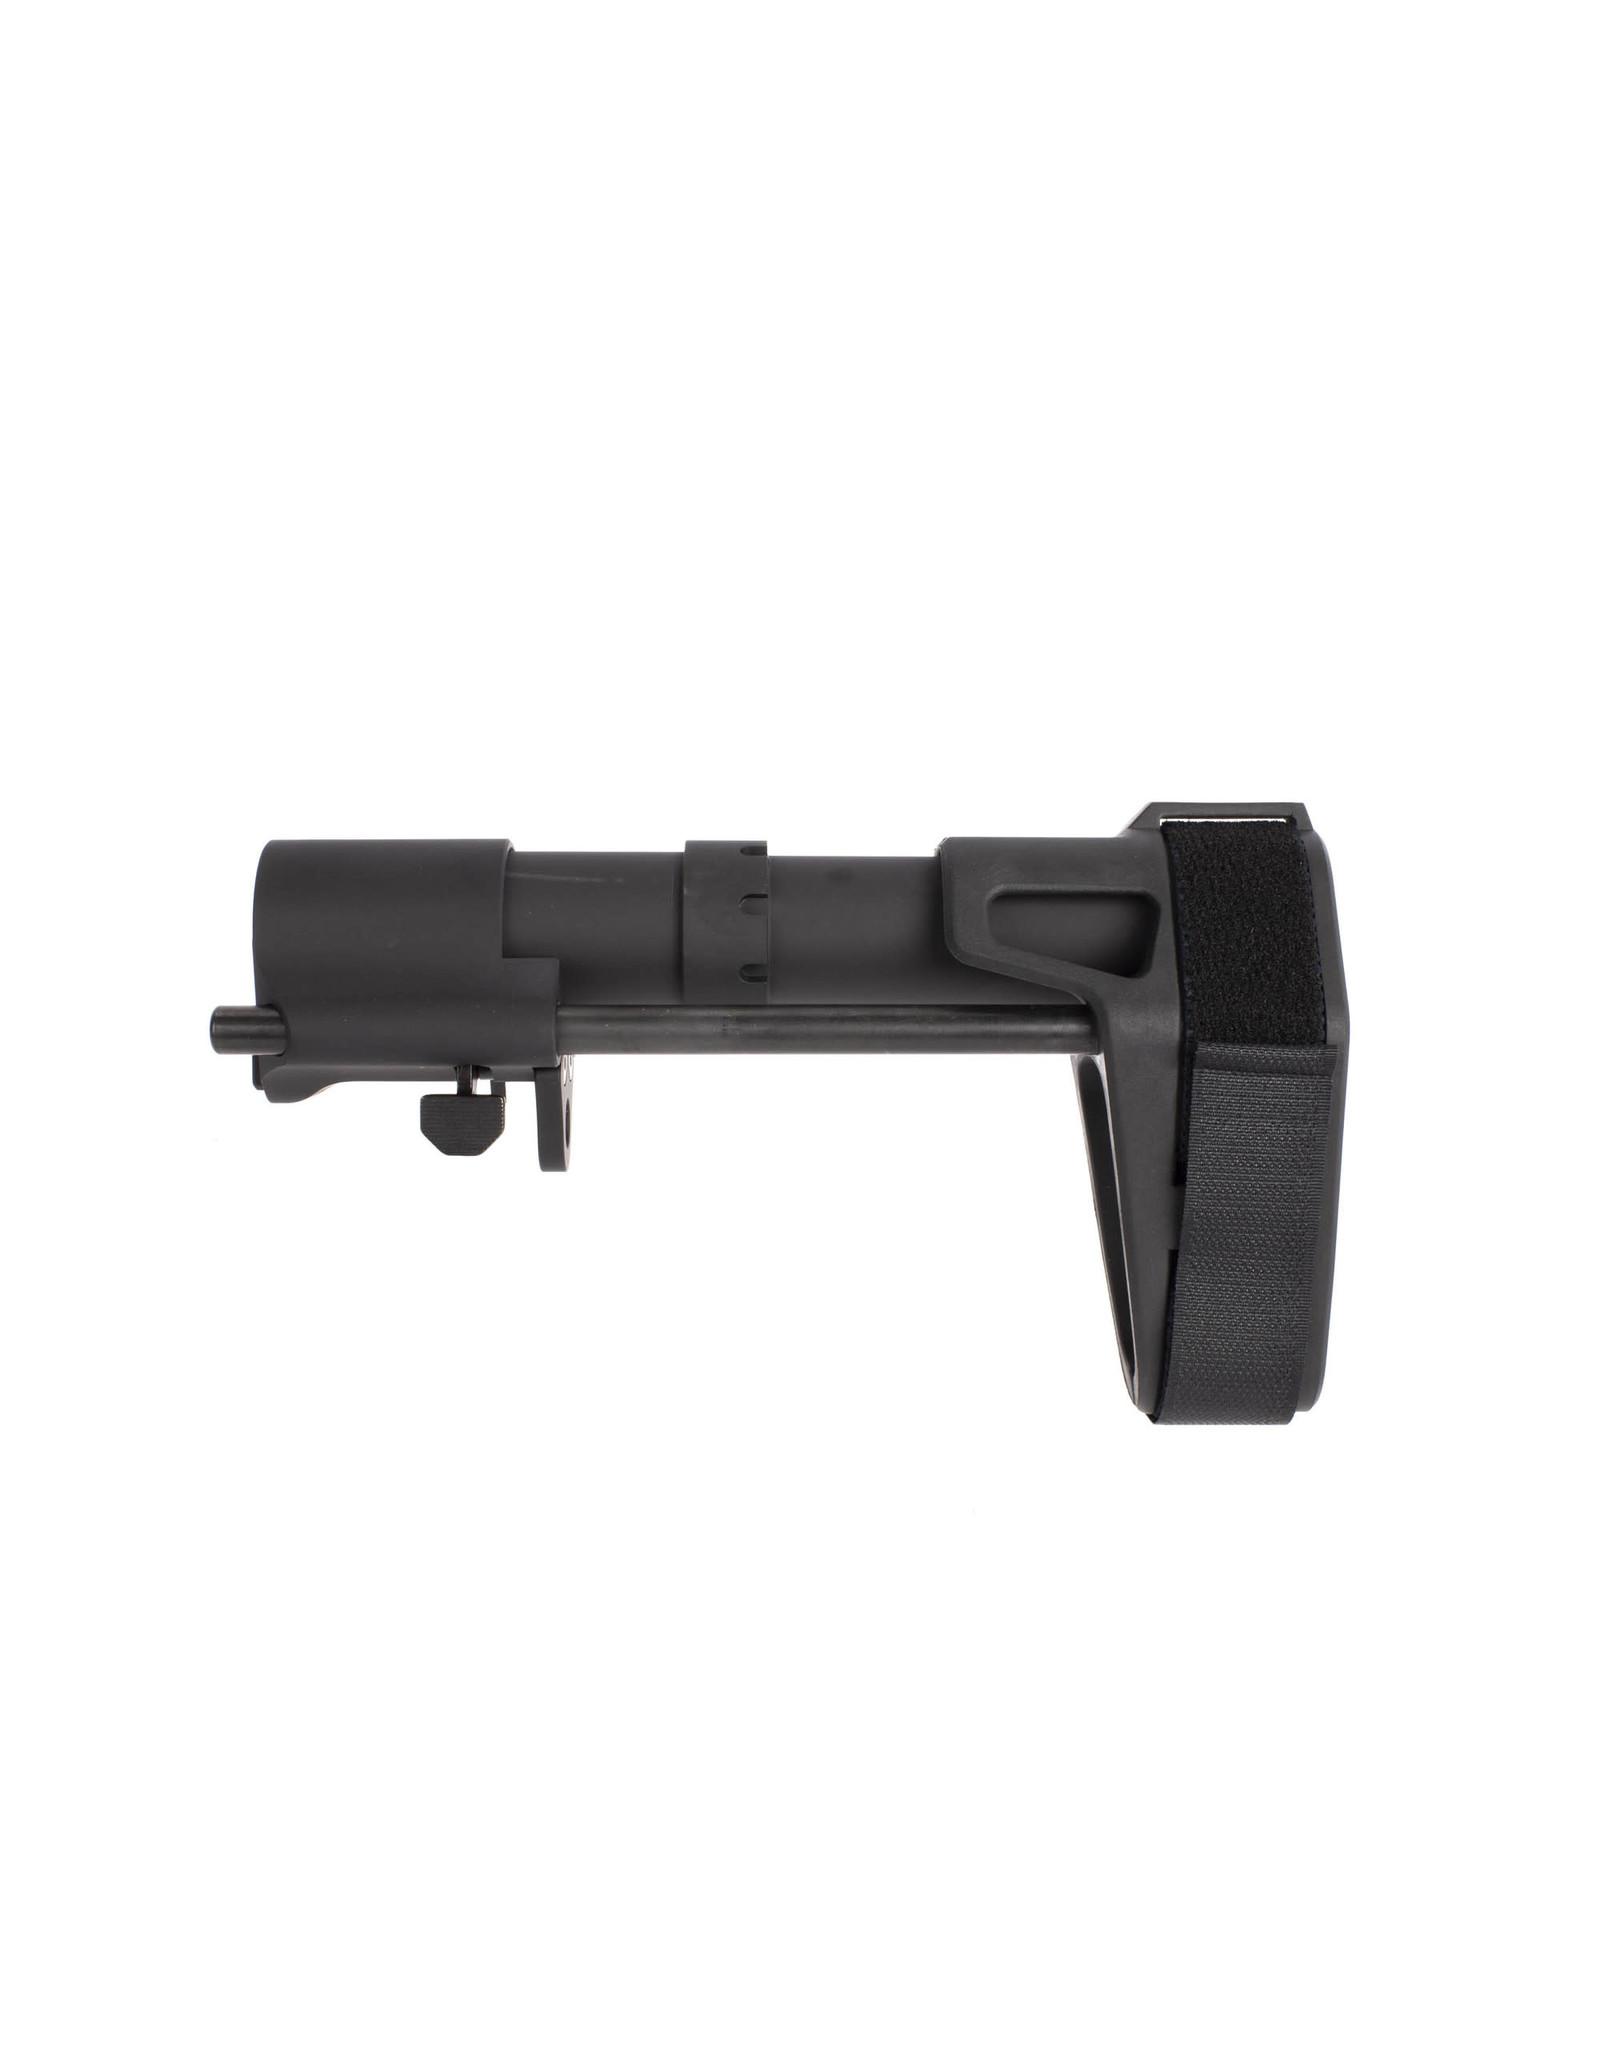 SB Tactical SB Tactical SBPDW AR Pistol Stabilizing Brace - Black